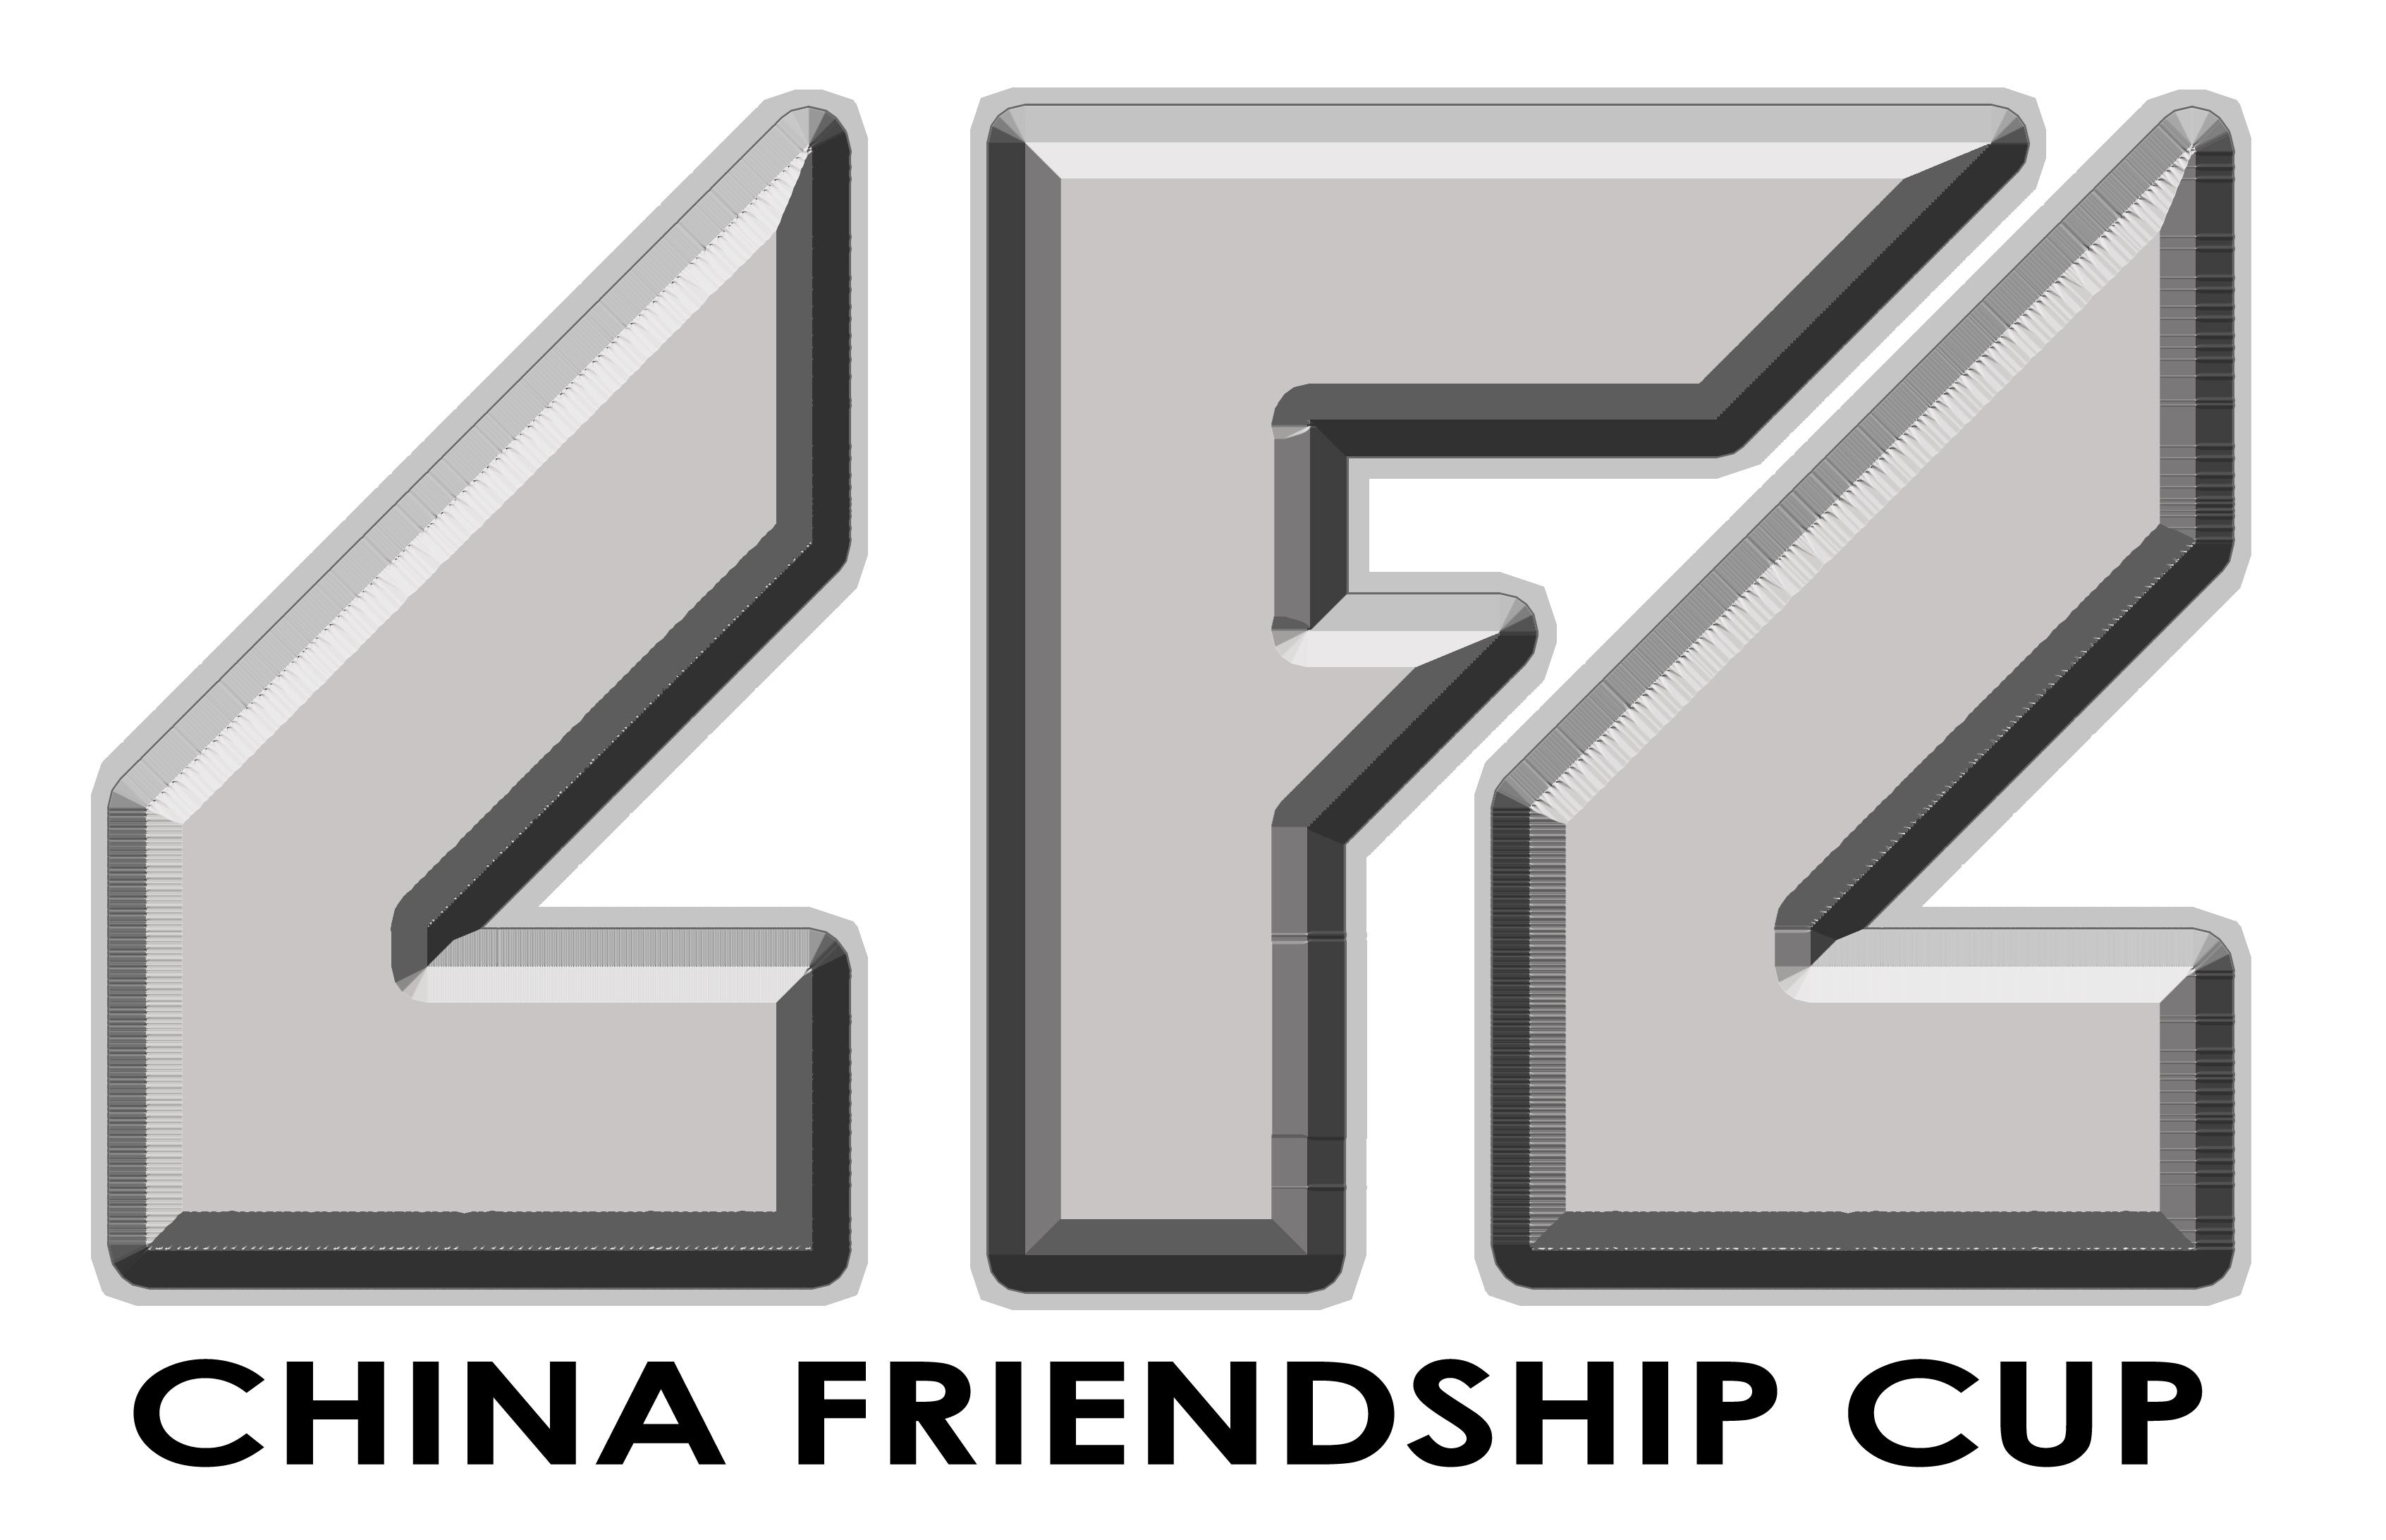 cfc-logo-final-silver